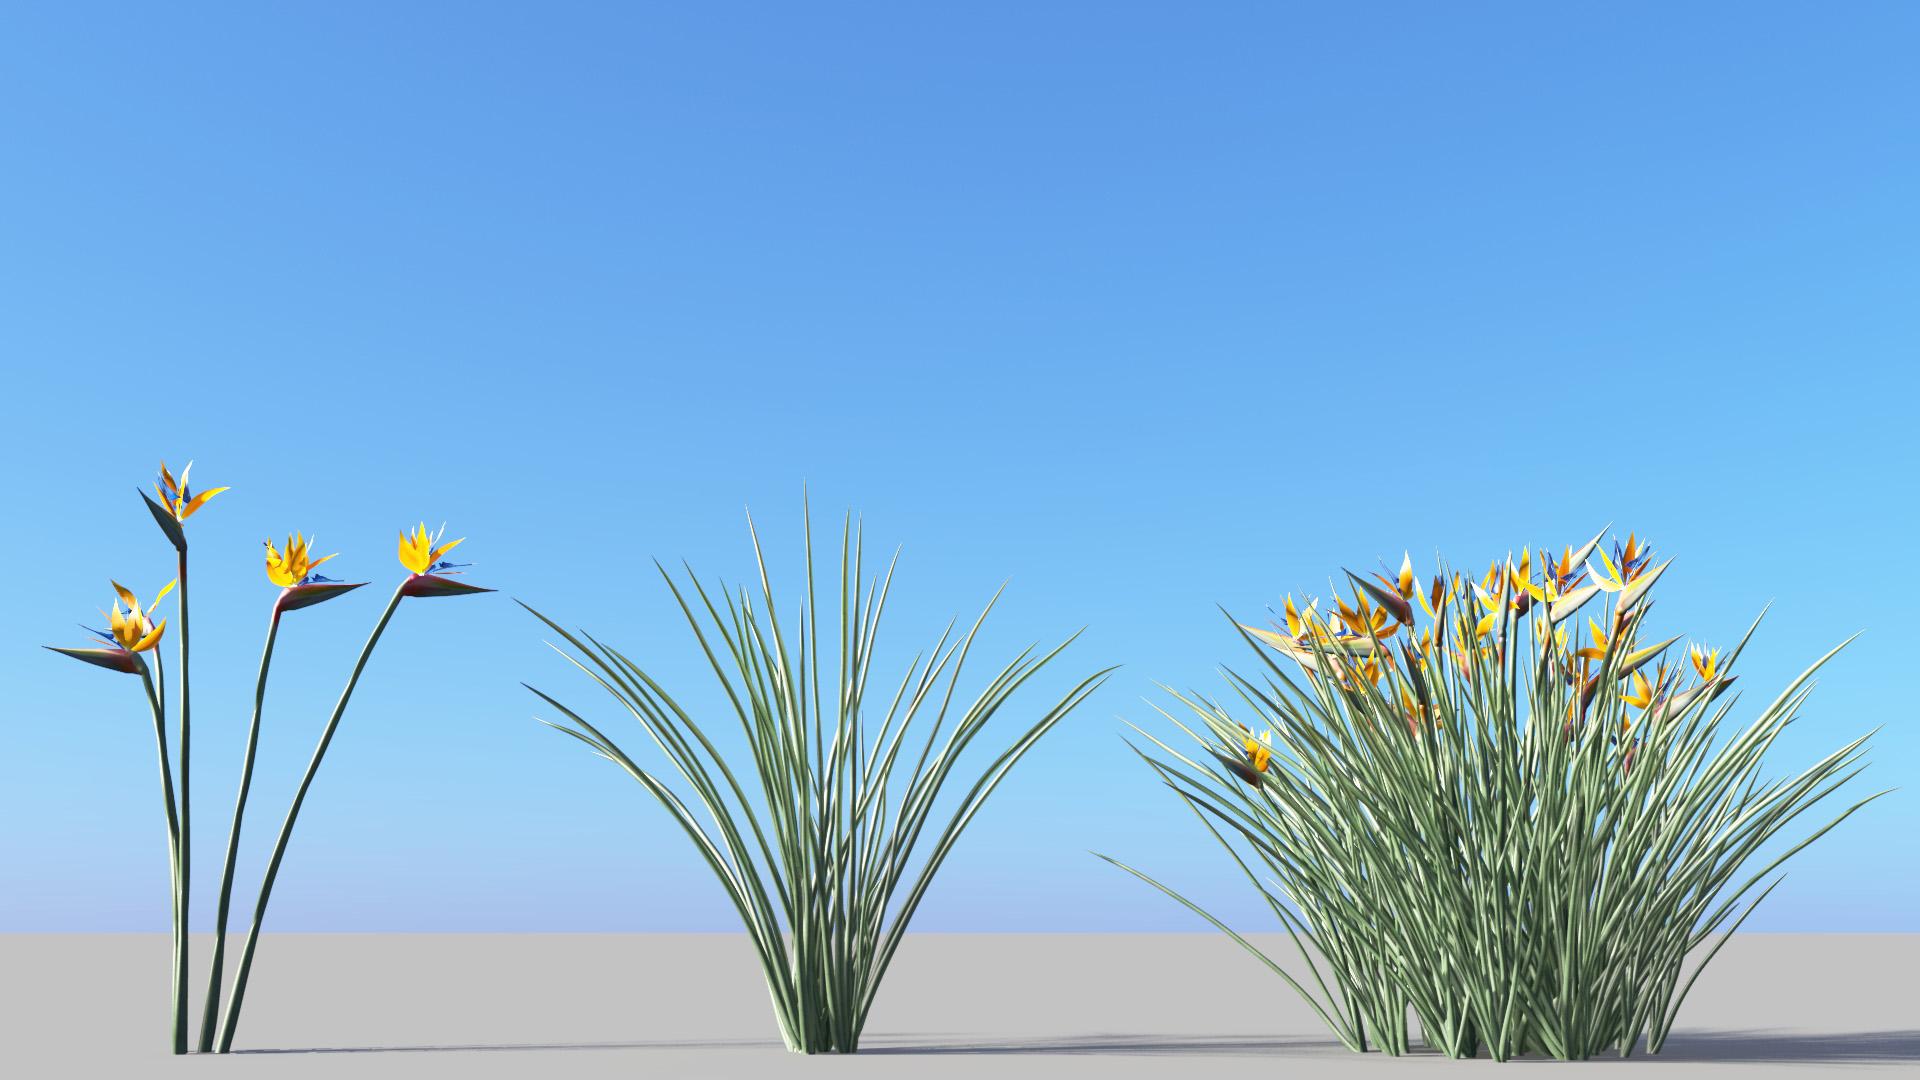 3D model of the Narrow leaved bird of paradise Strelitzia juncea